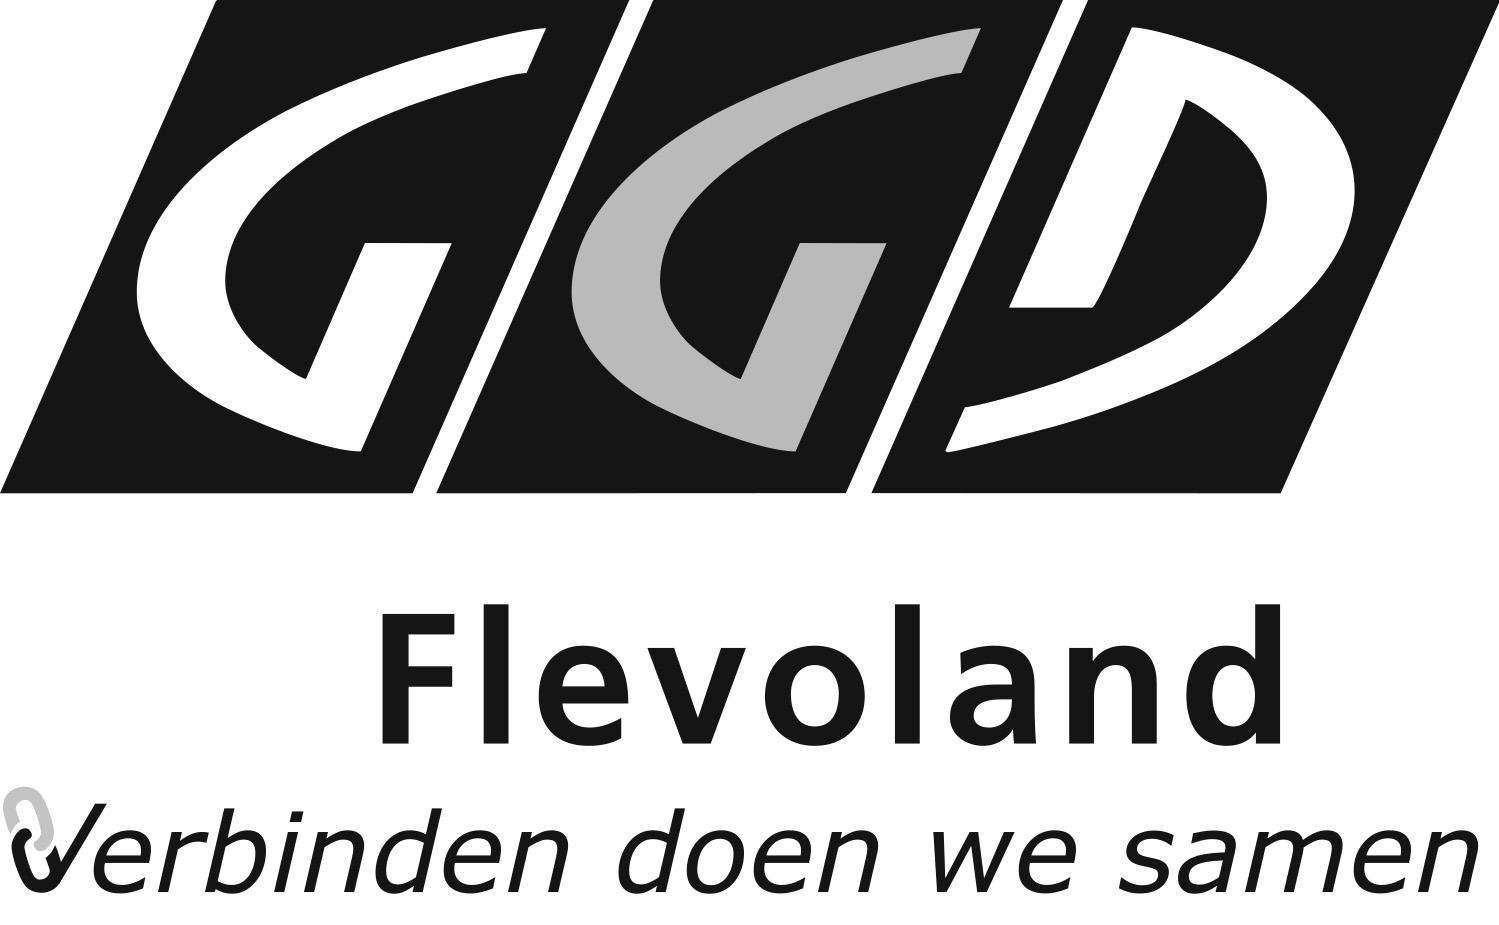 GGD Logo Verbinden doen we samen 2.jpg